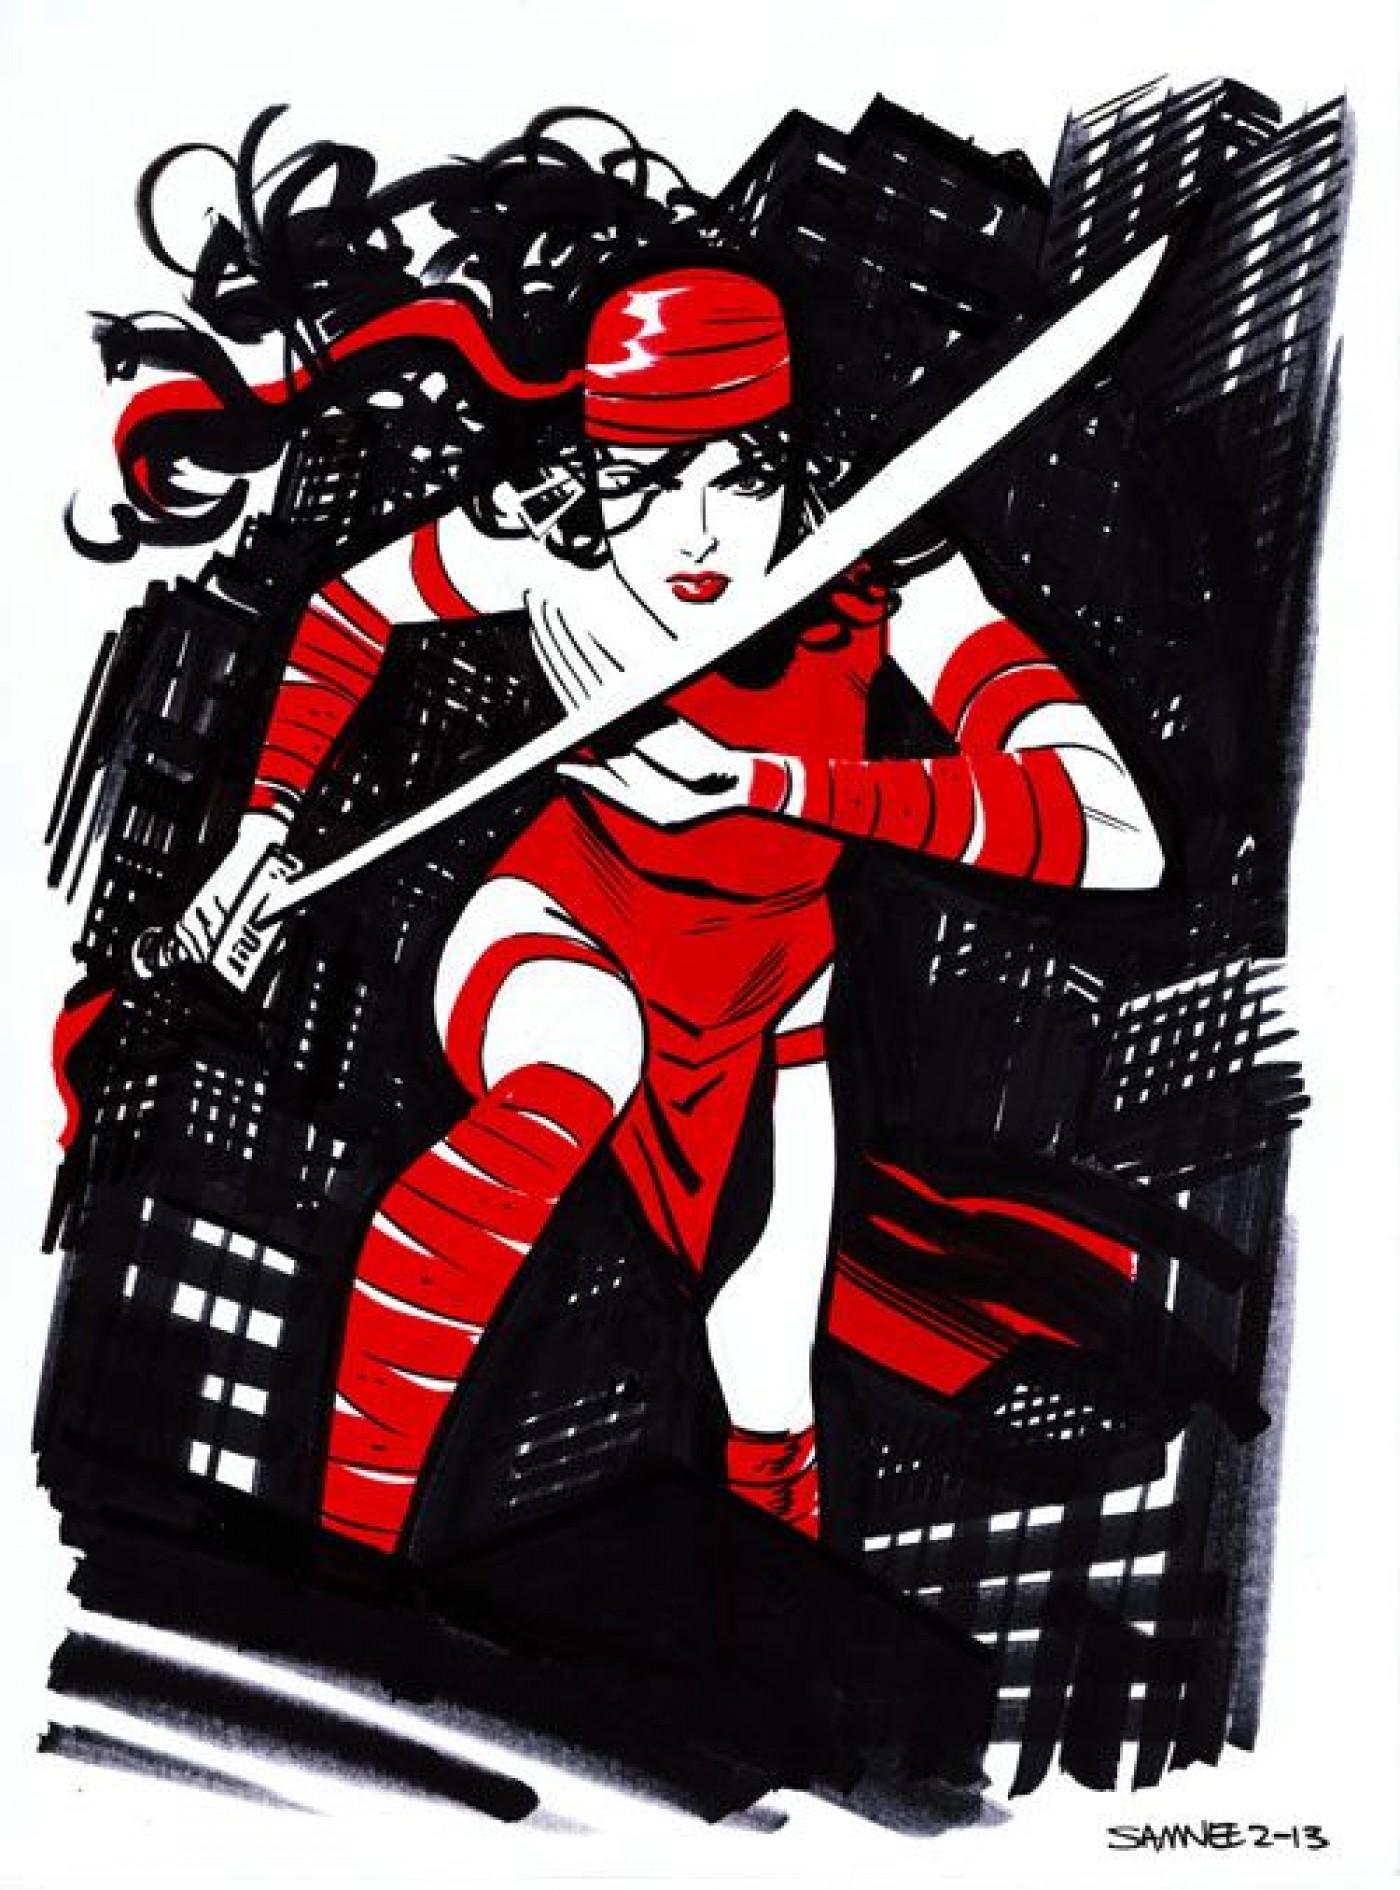 The story behind the Elektra of Prada